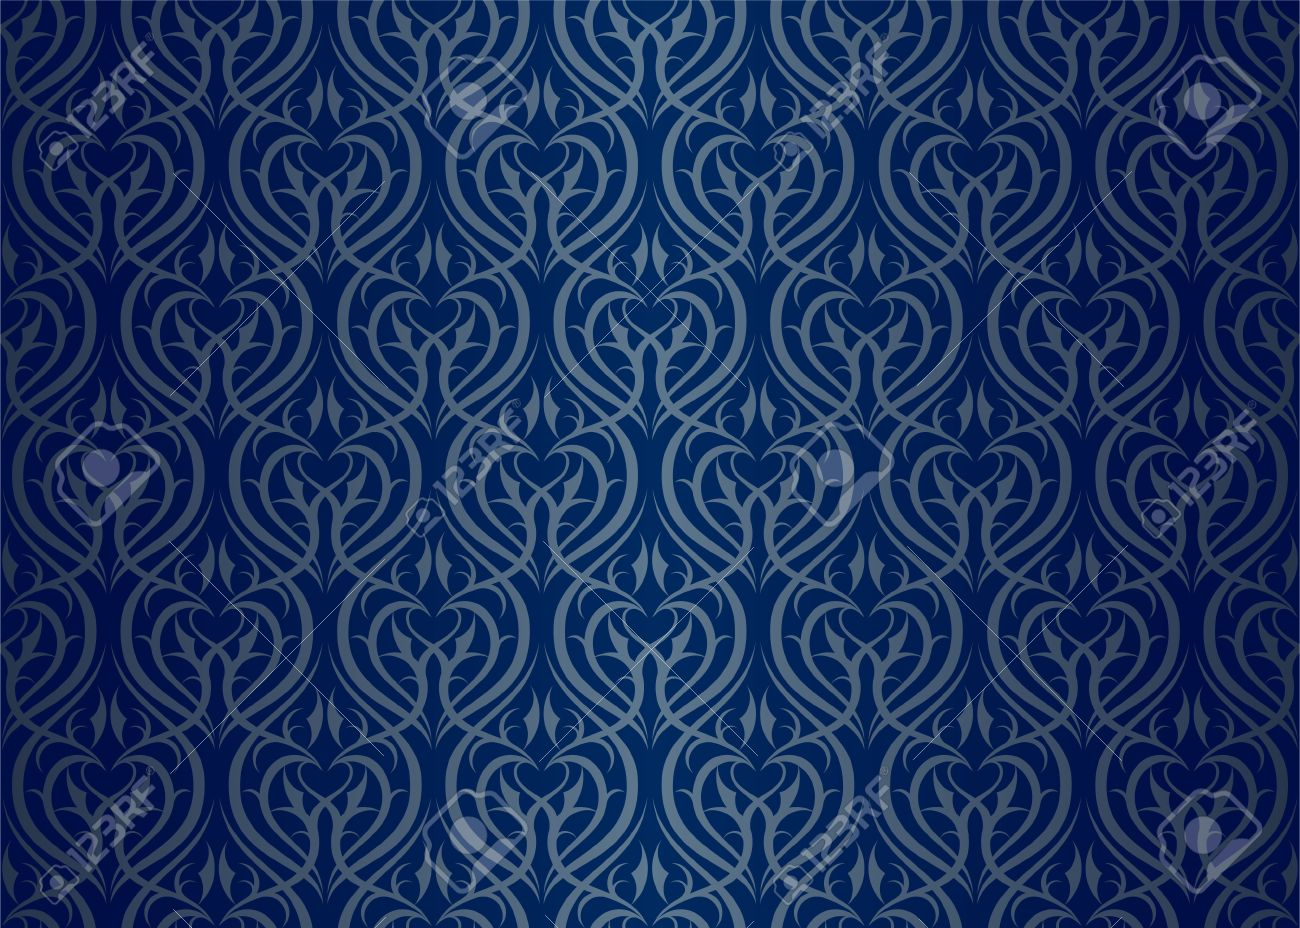 Seamless wallpaper pattern silver blue Stock Vector - 11298574